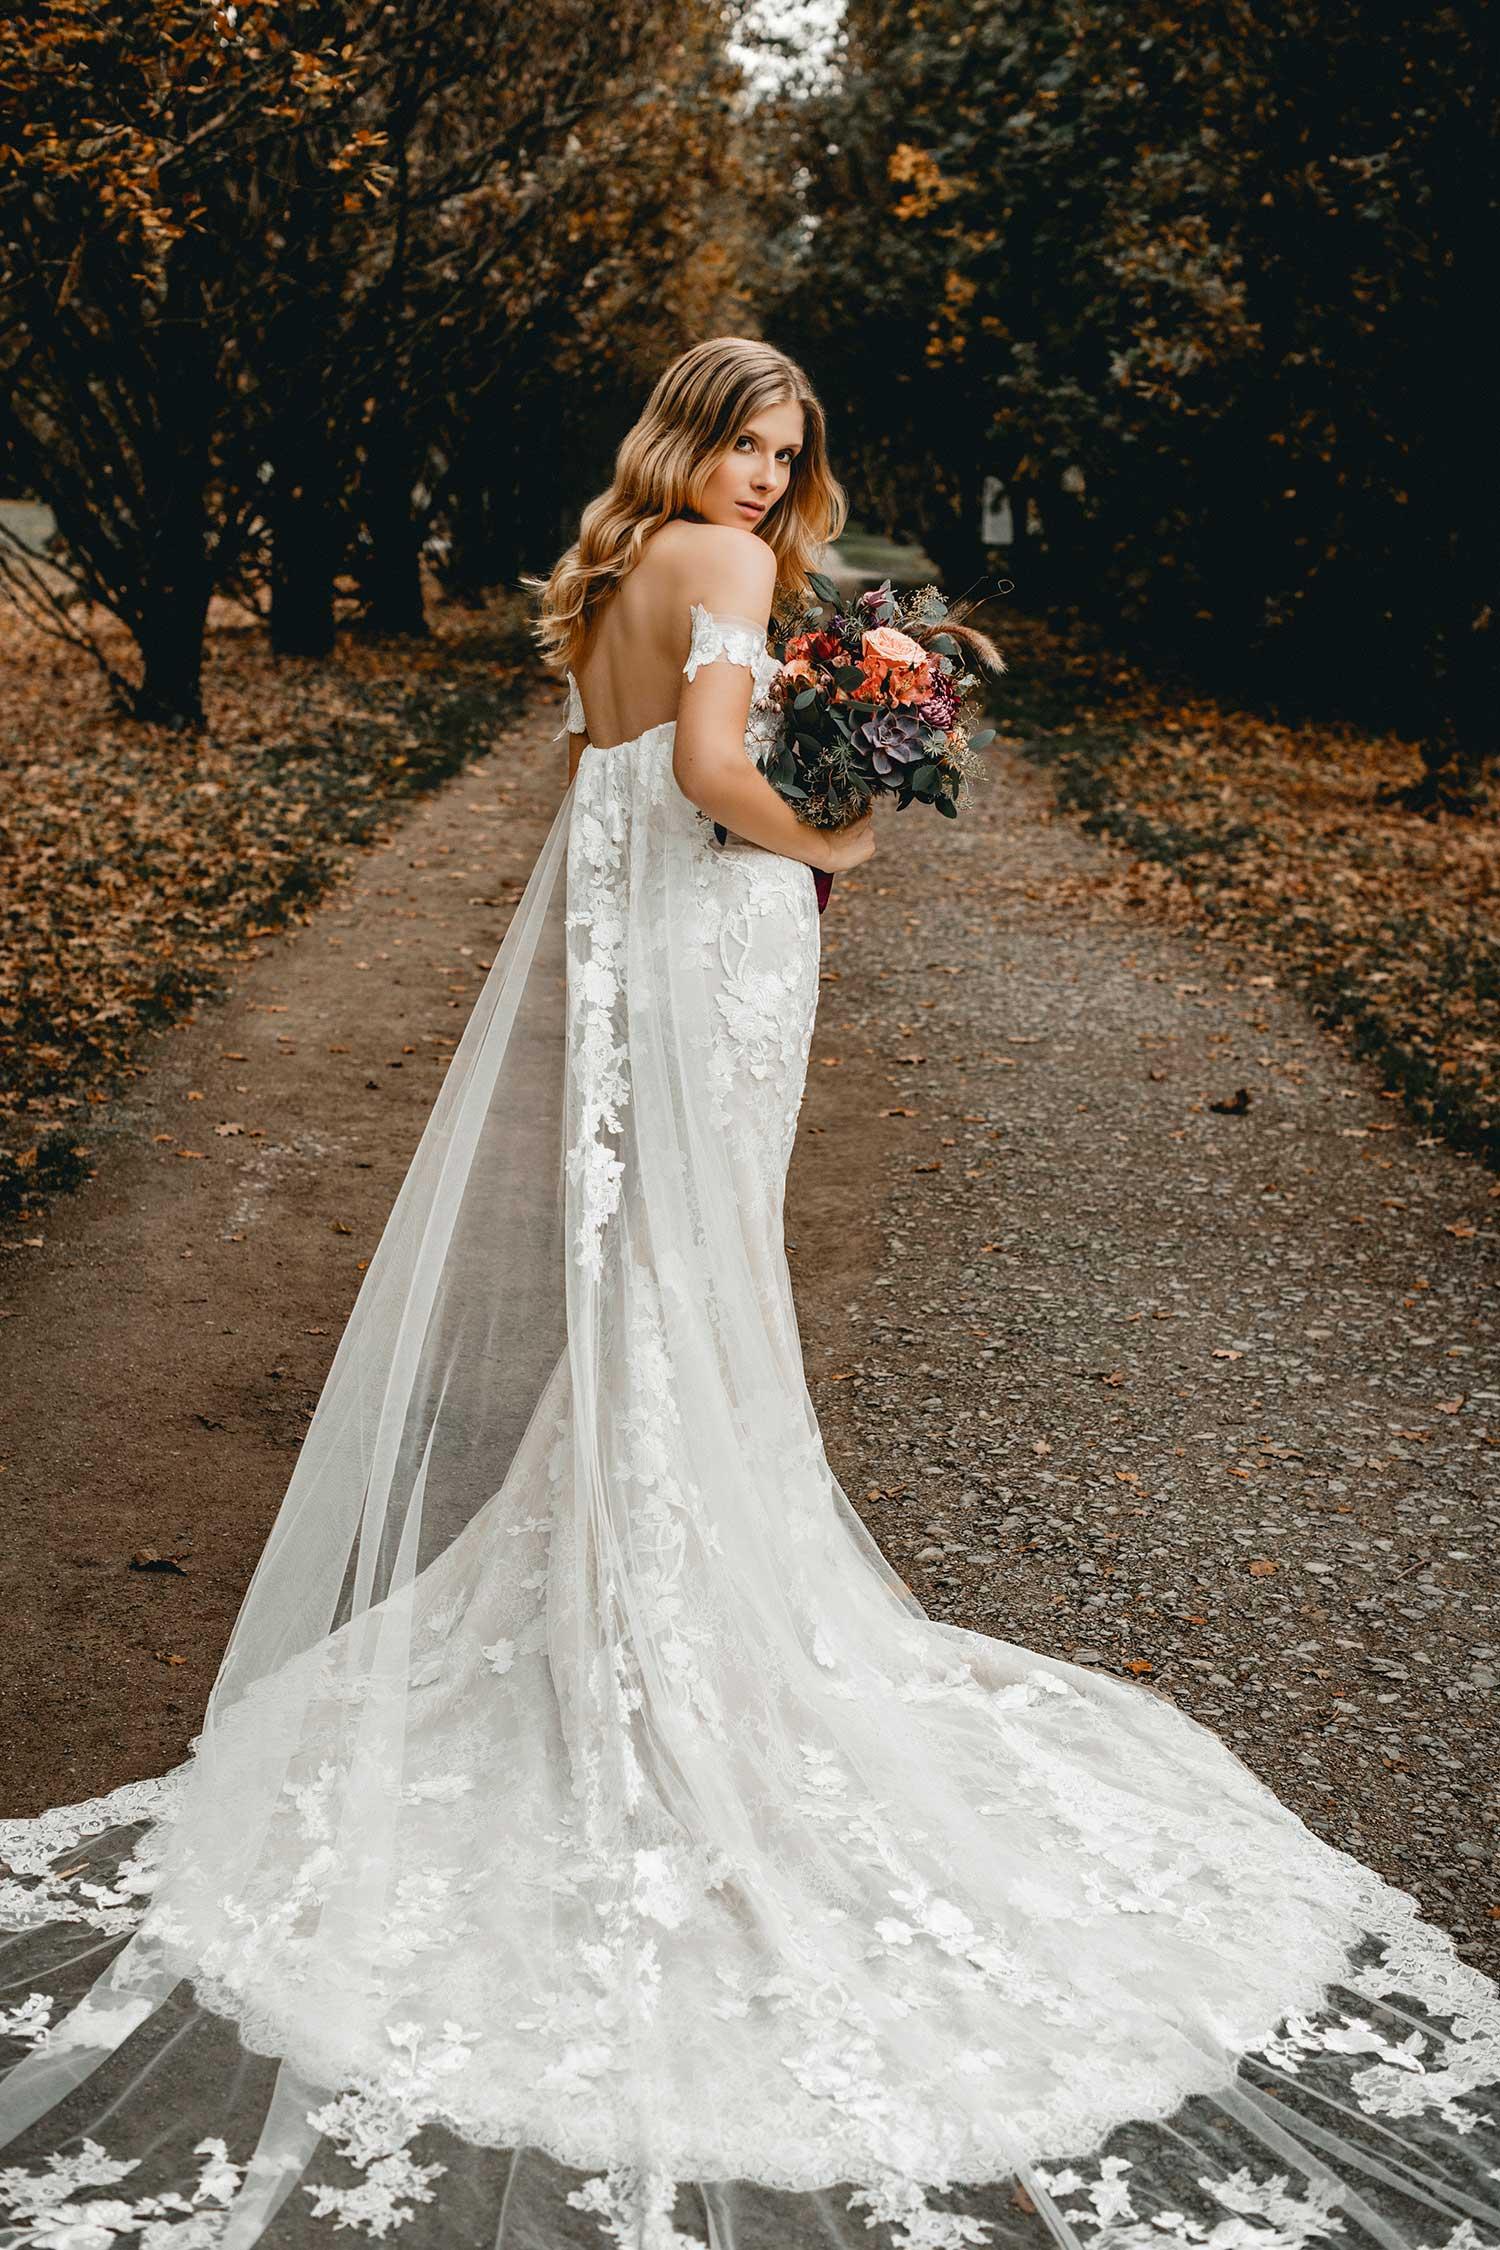 Elegant wedding dress and bridal bouquet